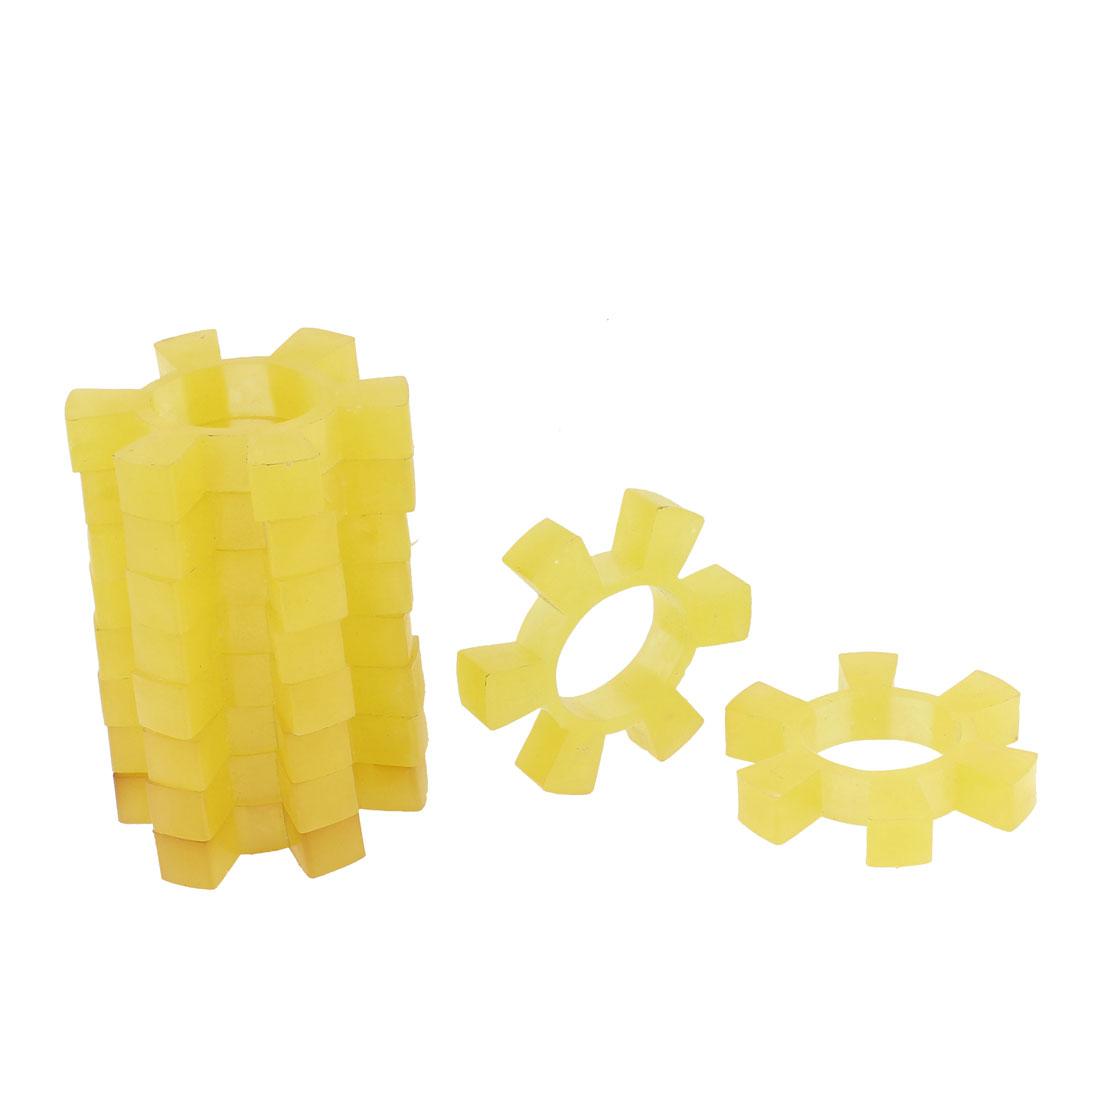 10pcs Flexible Plastic Coupling Coupler Damper Yellow 90mm Dia